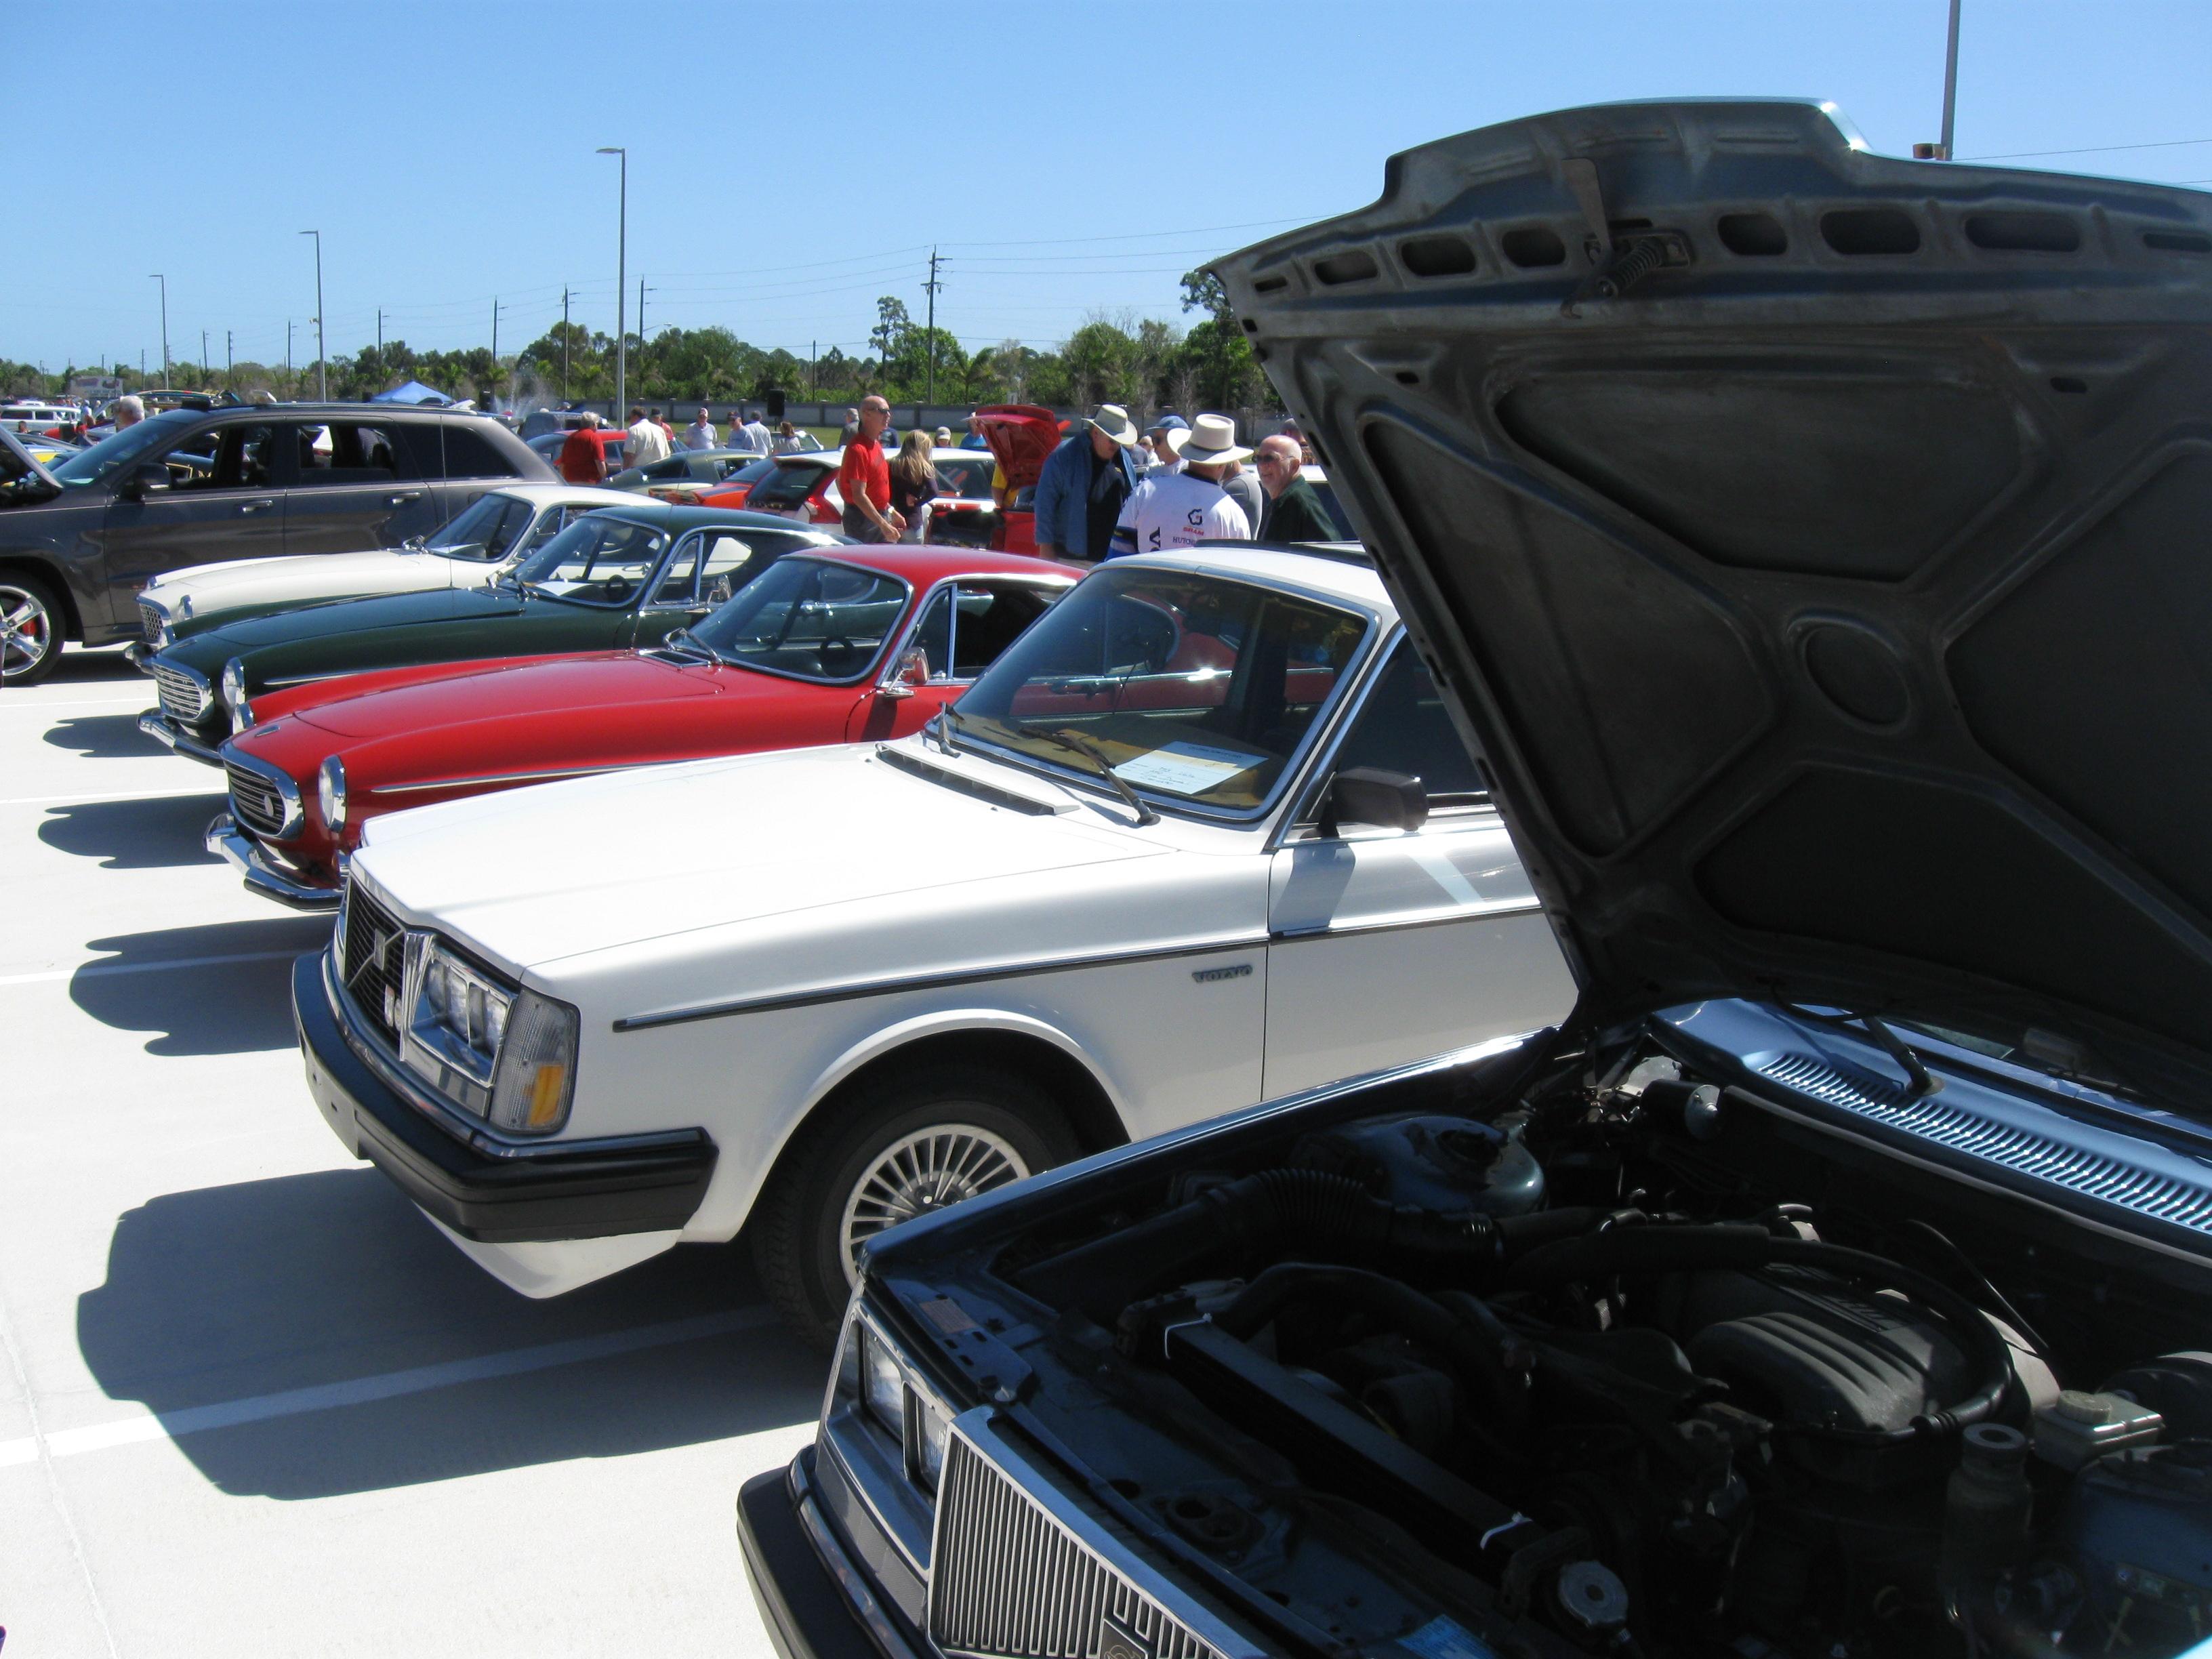 Florida Volvo Club Of American FLVCOA Blog - Naples antique car show 2018